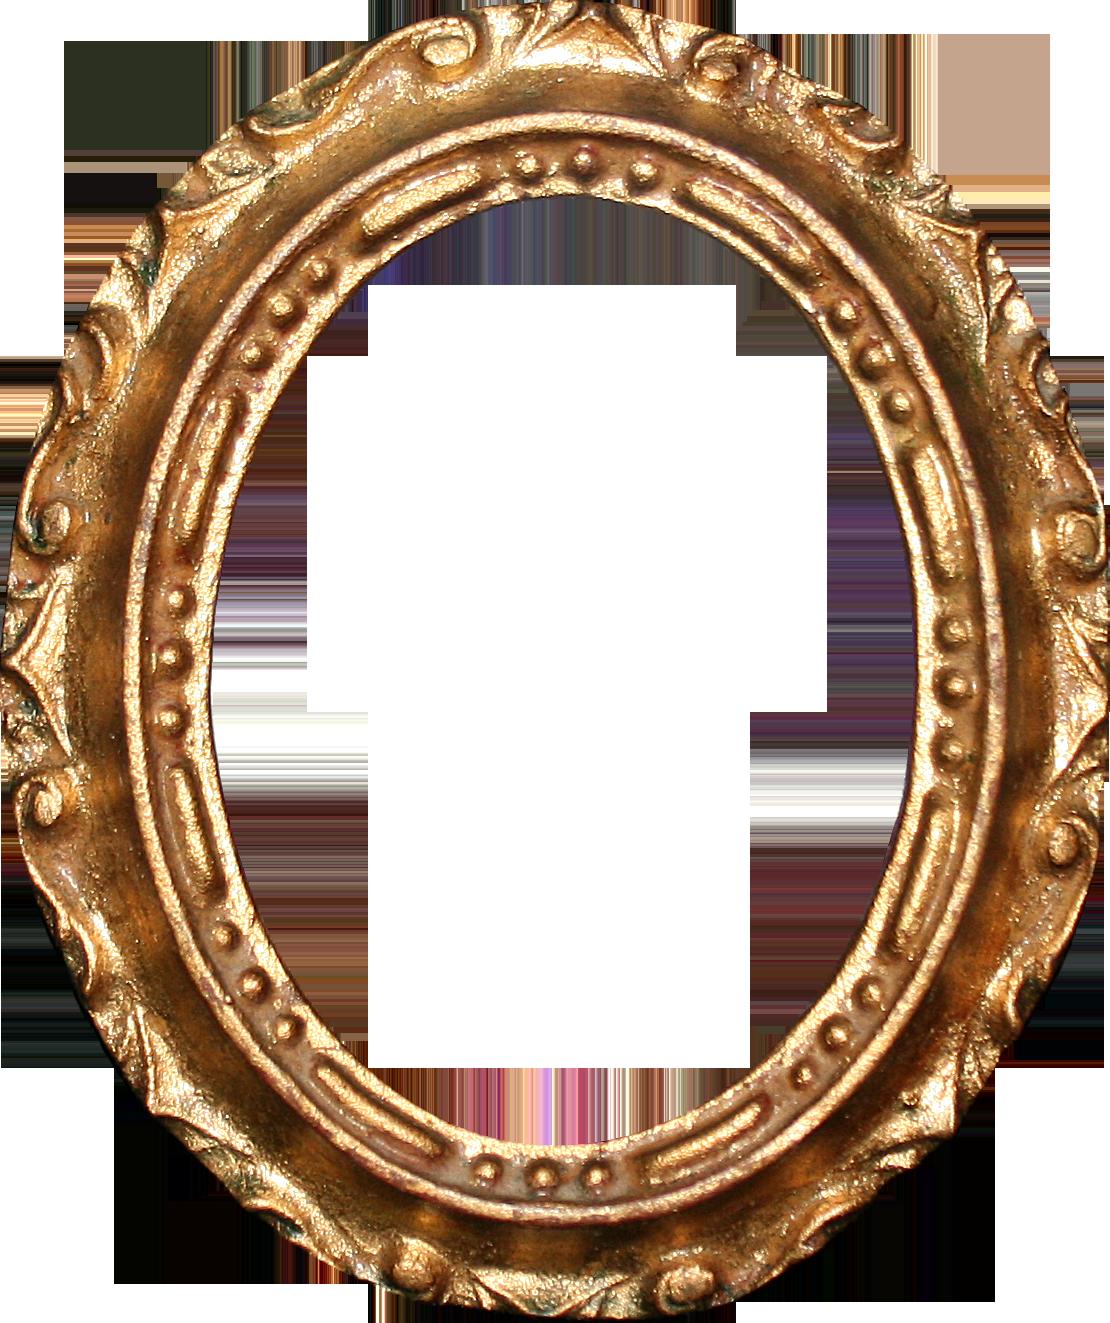 Рамки для круглой картины